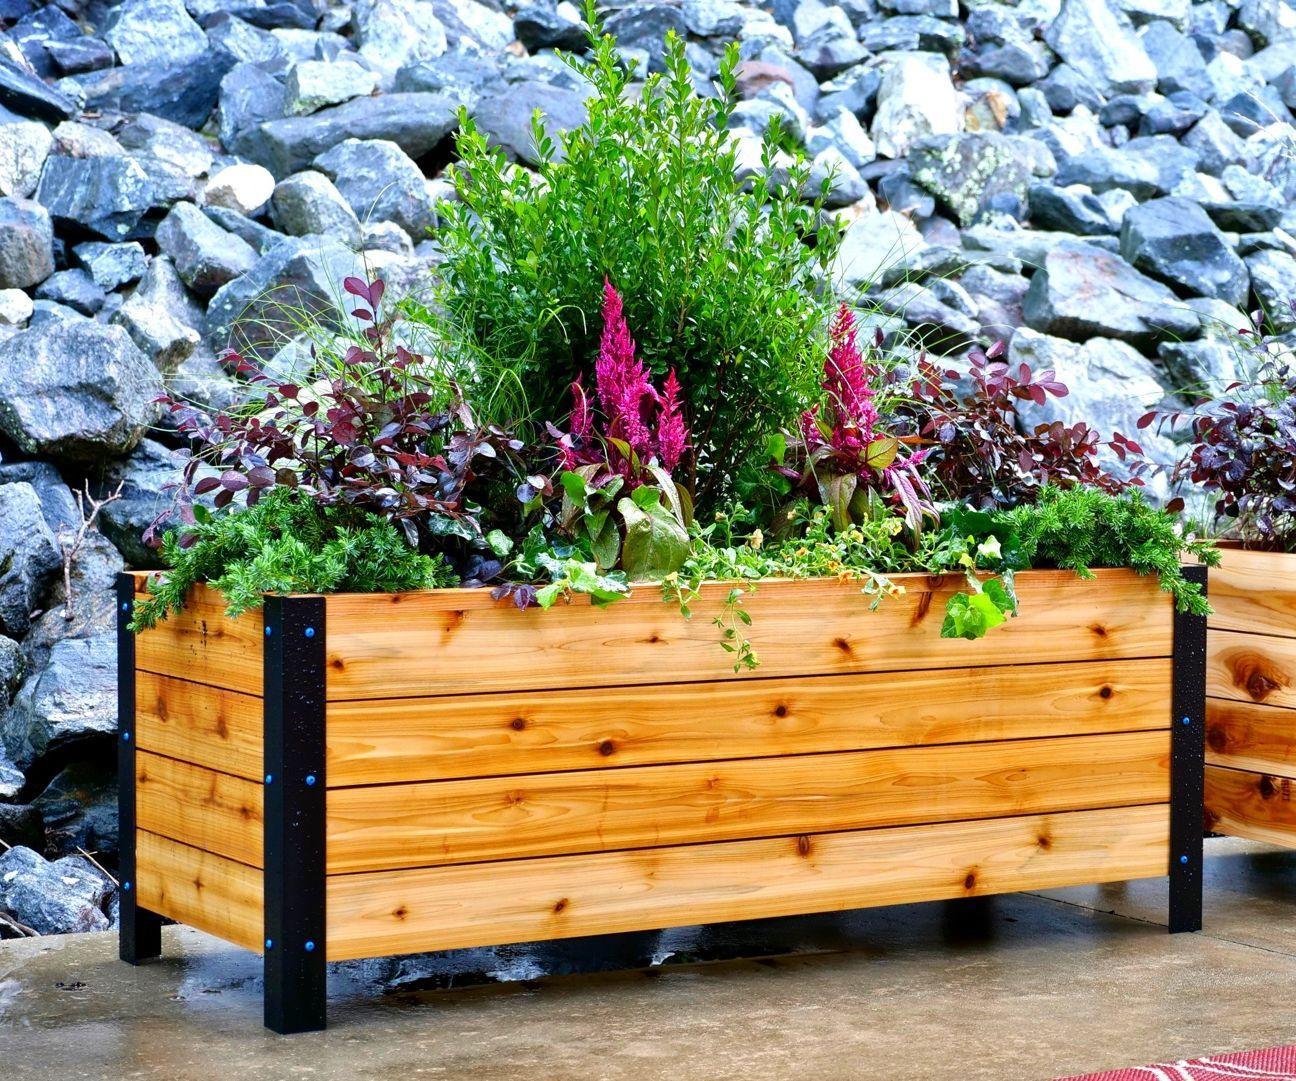 DIY Modern Raised Planter Box // How to Build